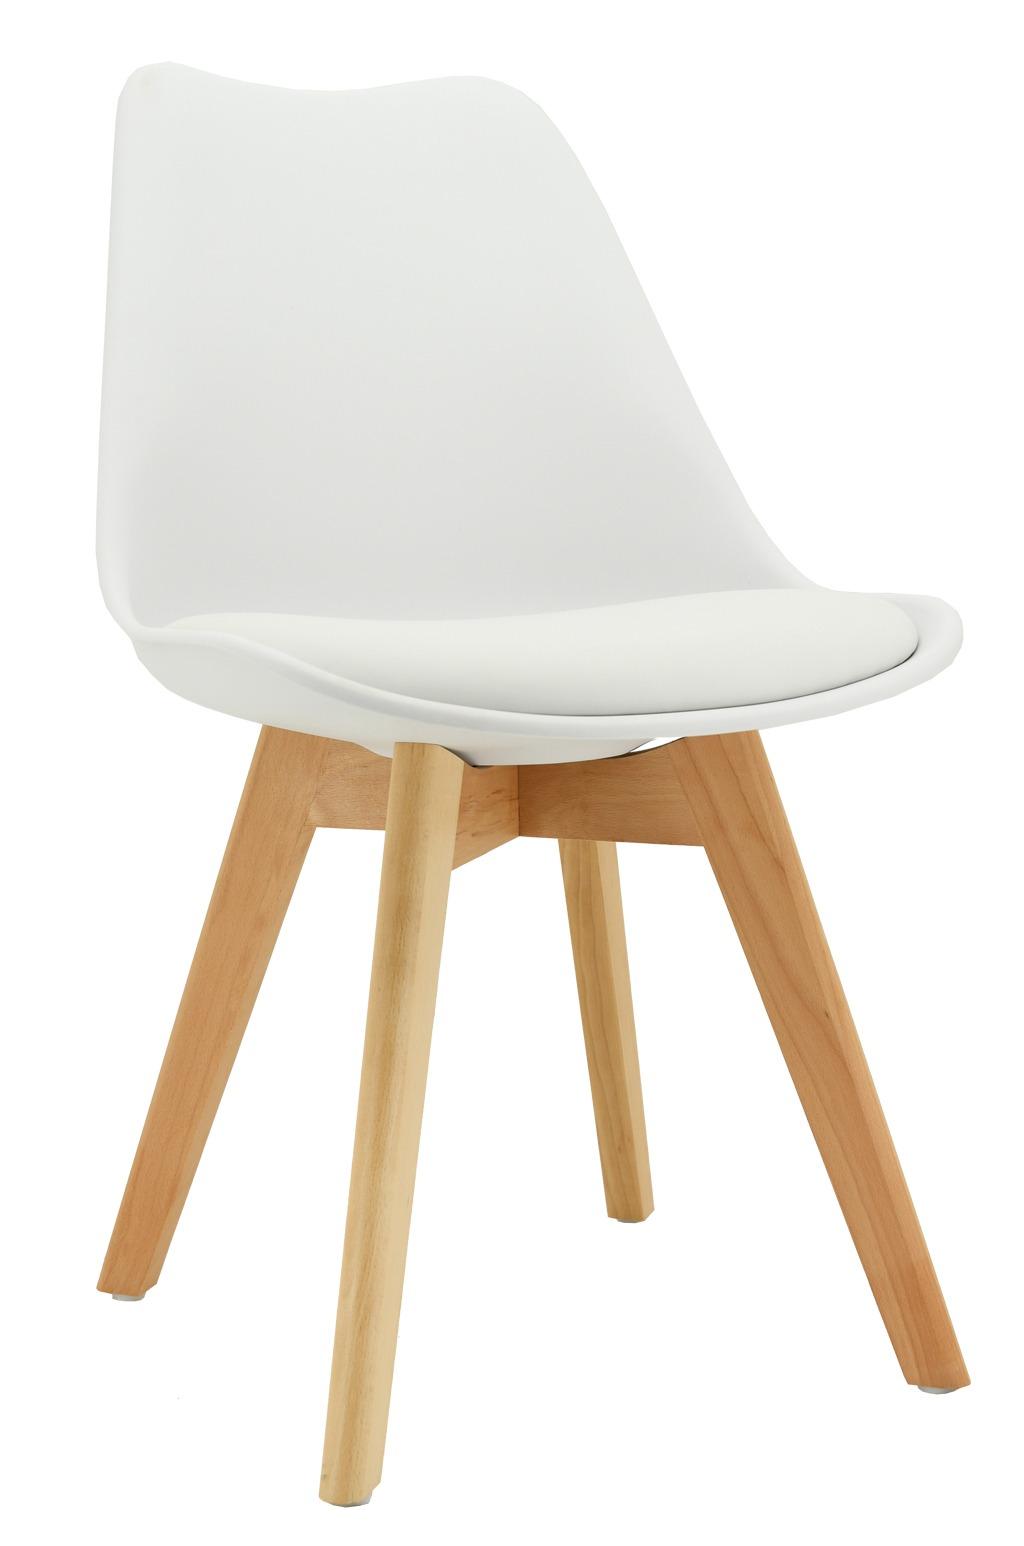 chaise coussin en polypropylene blanc et bois blanc